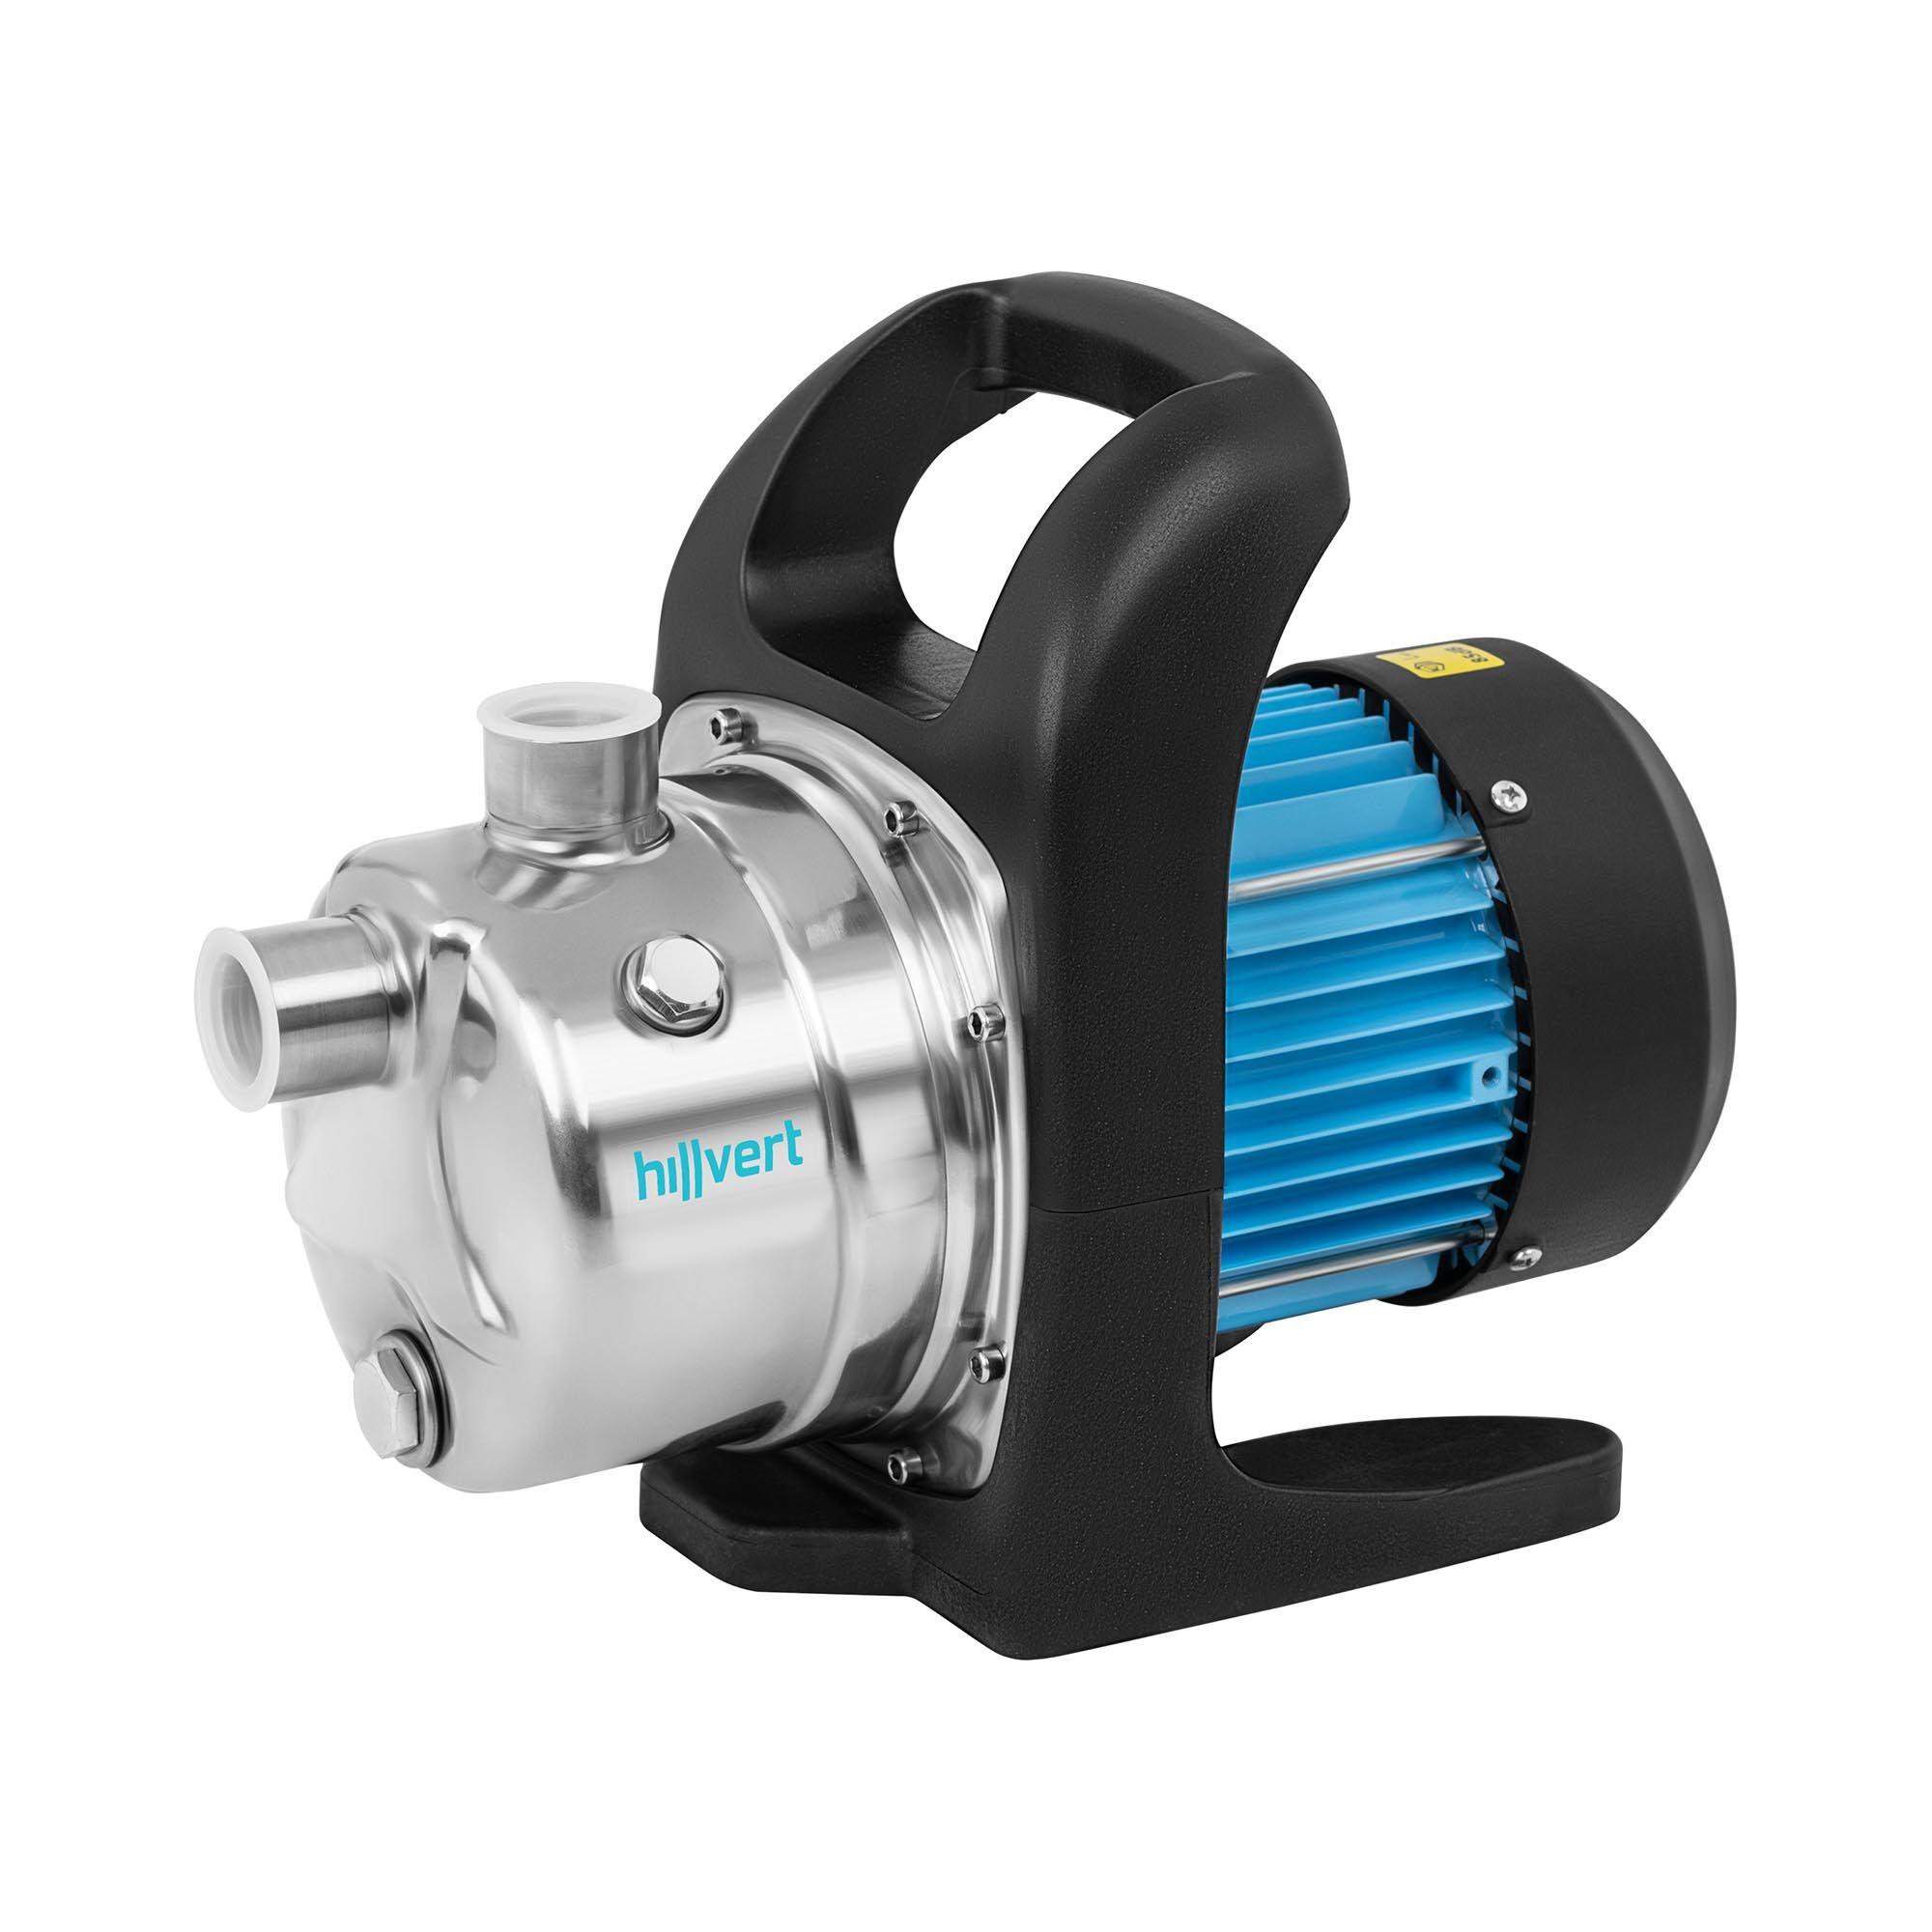 hillvert Pompe de jardin - 2 900 l/h - 800 W - Acier inoxydable HT-ROBSON-GP800